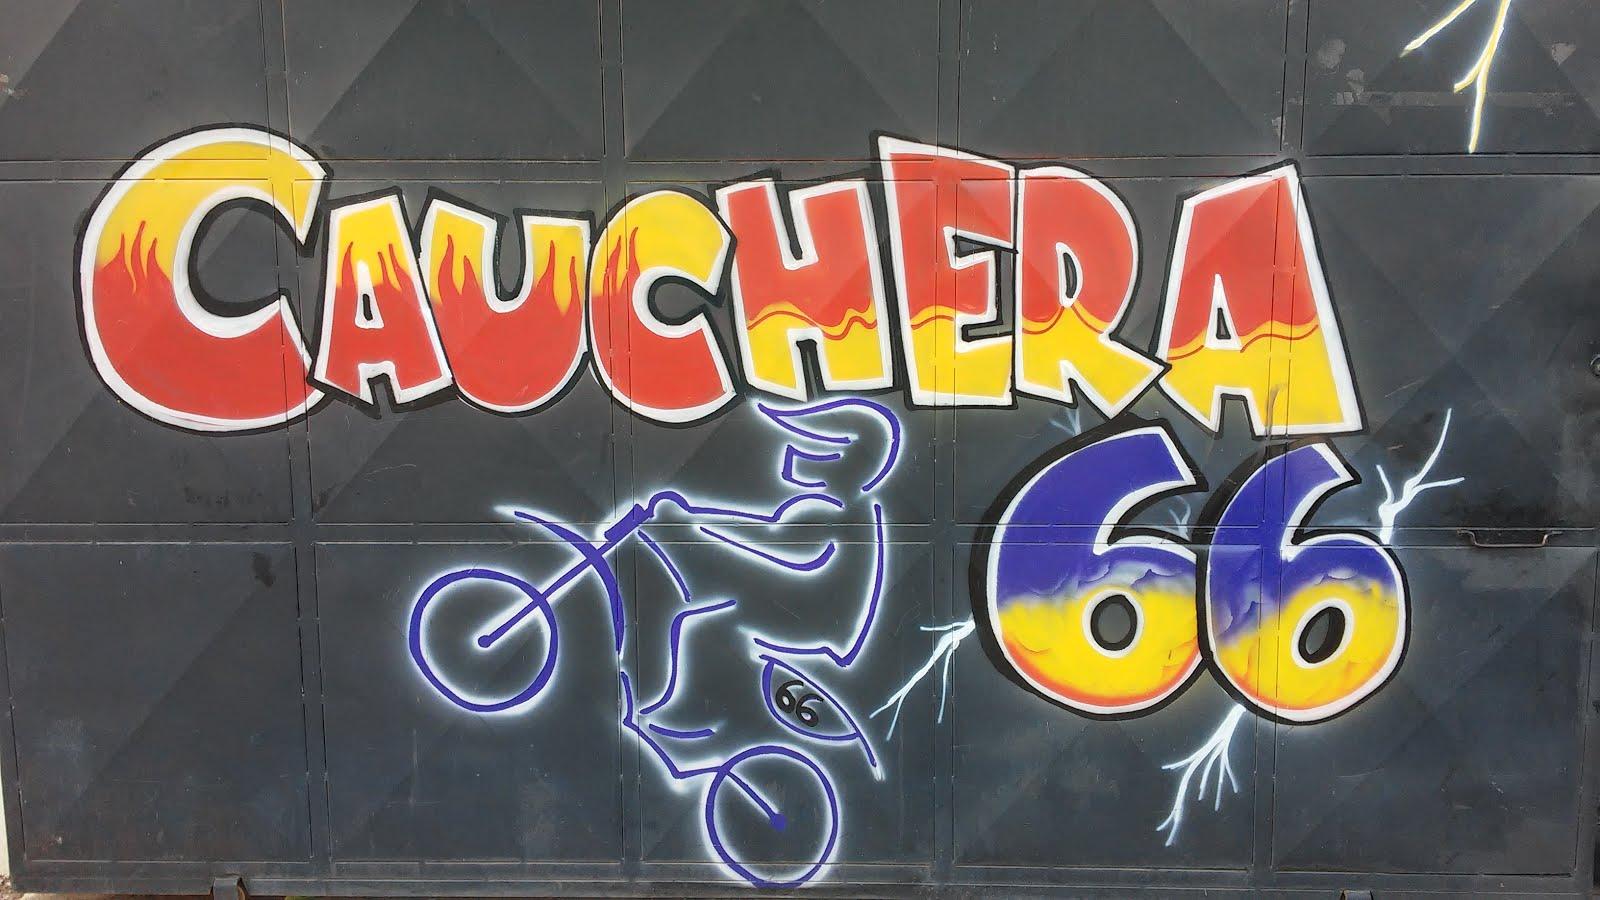 CAUCHERA 66